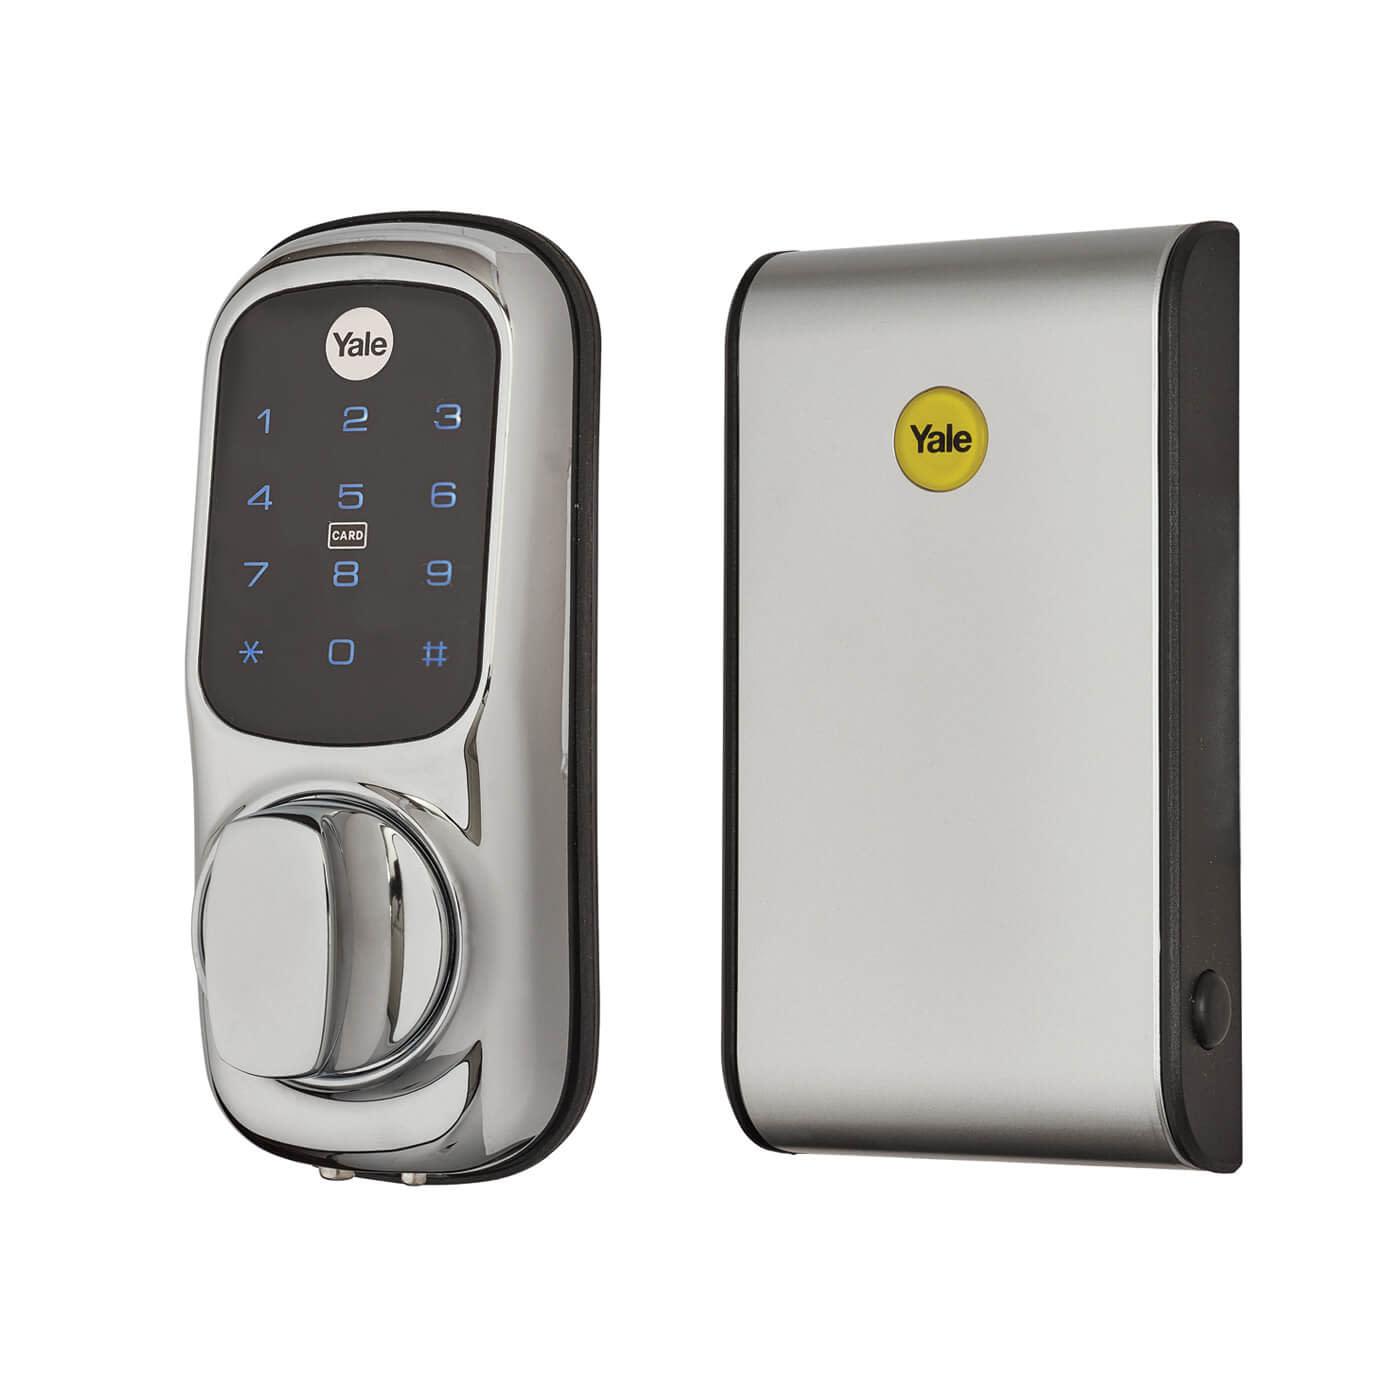 Yale Keyless Nightlatch Connected Ready Smart Lock - No Module - Silver)